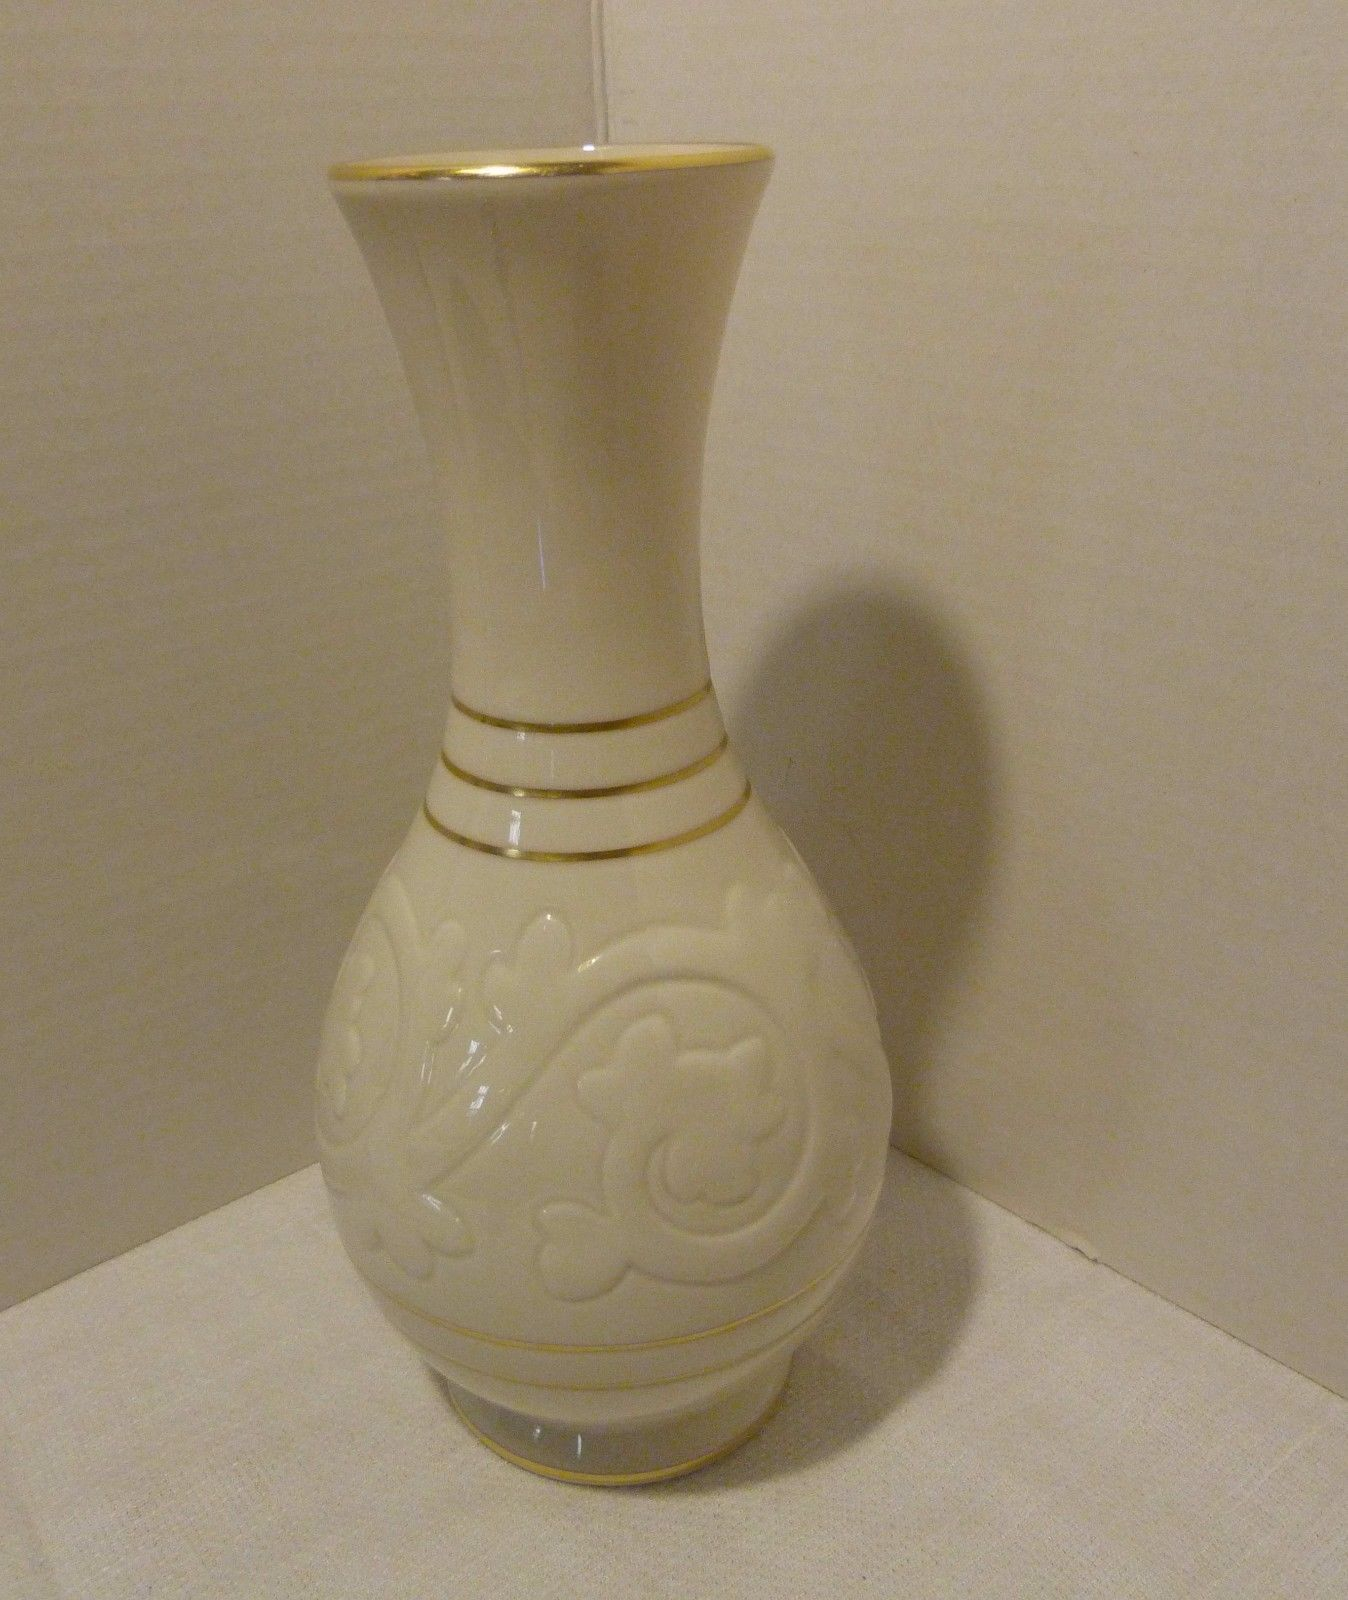 Lenox USA Rare Ivory and Gold Trim Vase Pattern 2078 Blue/Green Mark 1931-1953